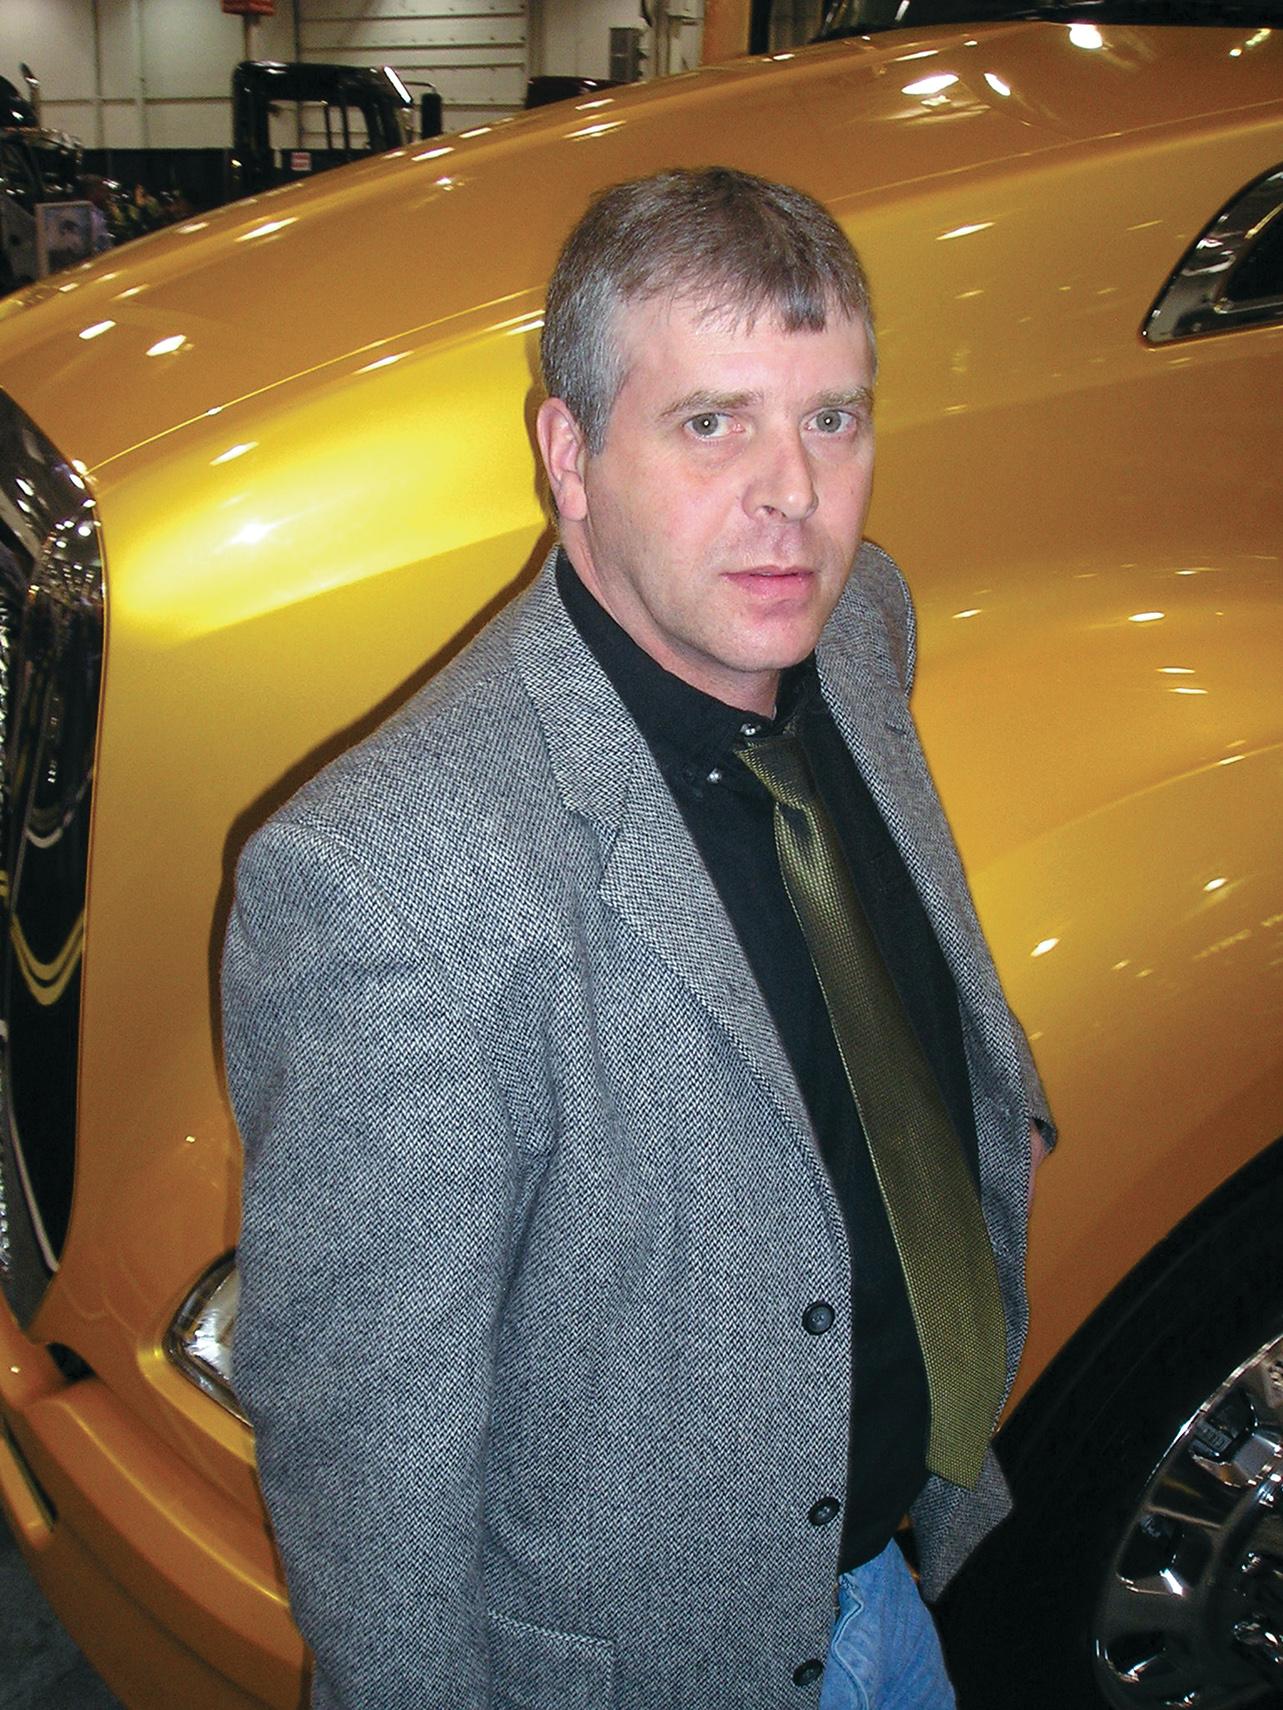 Stephen McGibbon